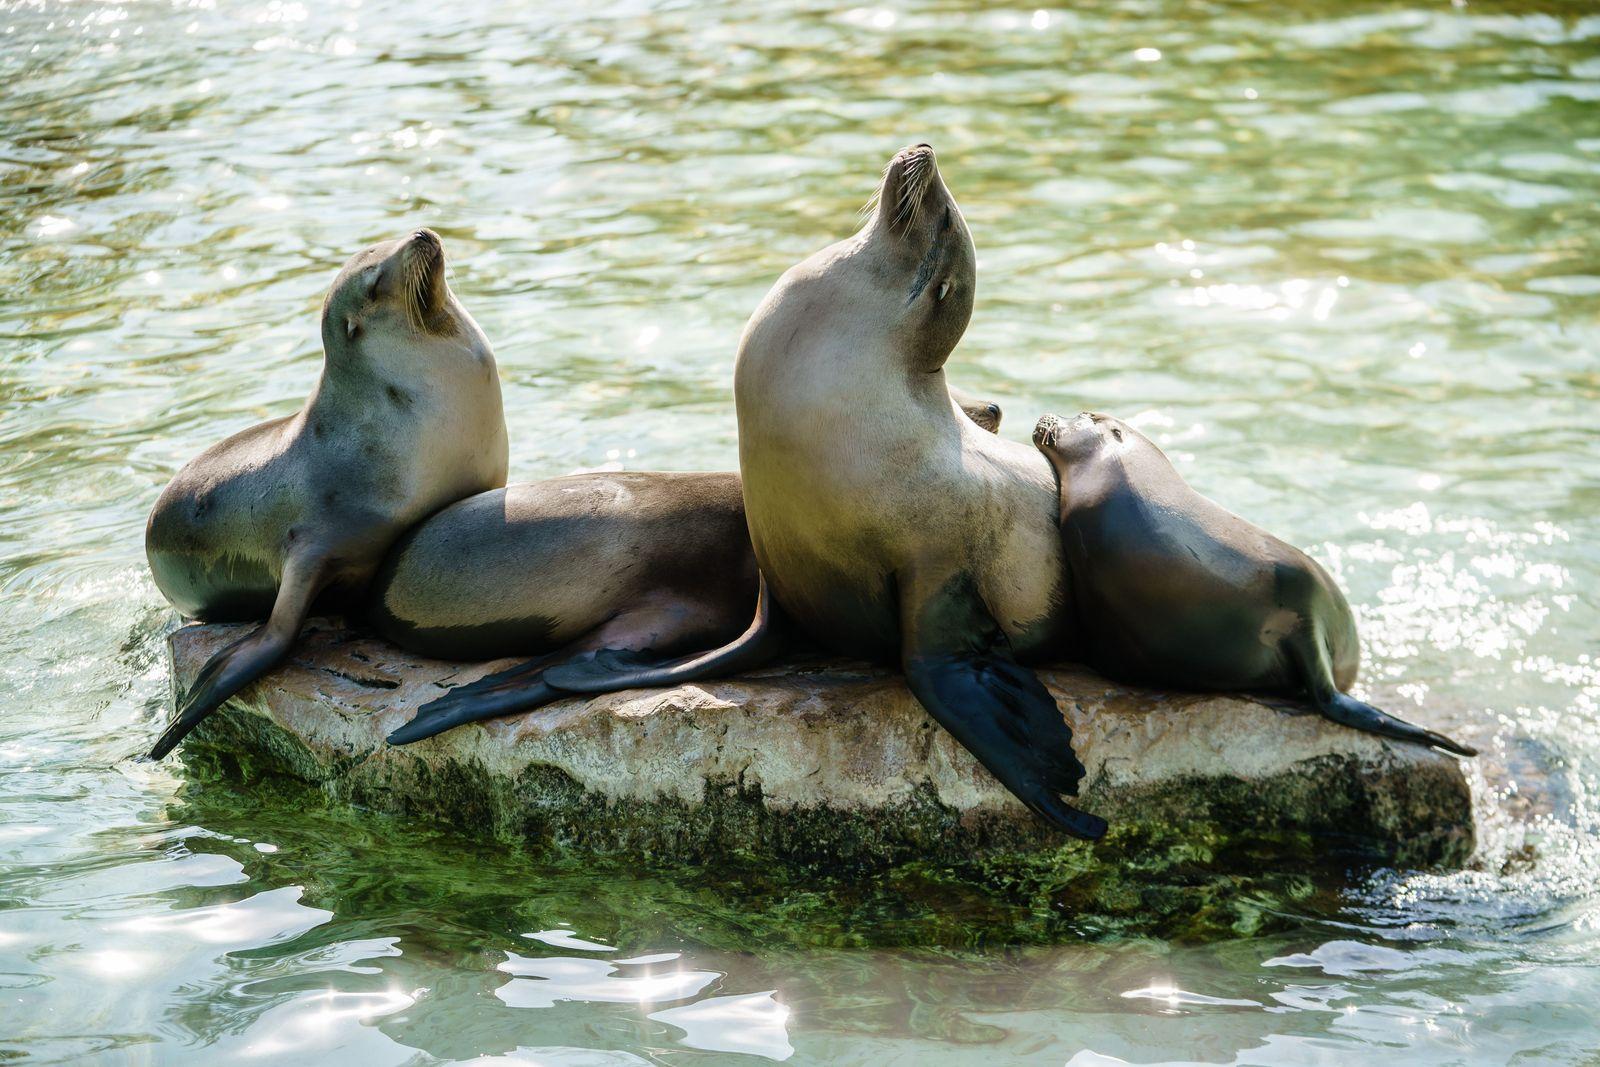 Berlin zoo reopens amid easing coronavirus restrictions in Germany - 28 Apr 2020